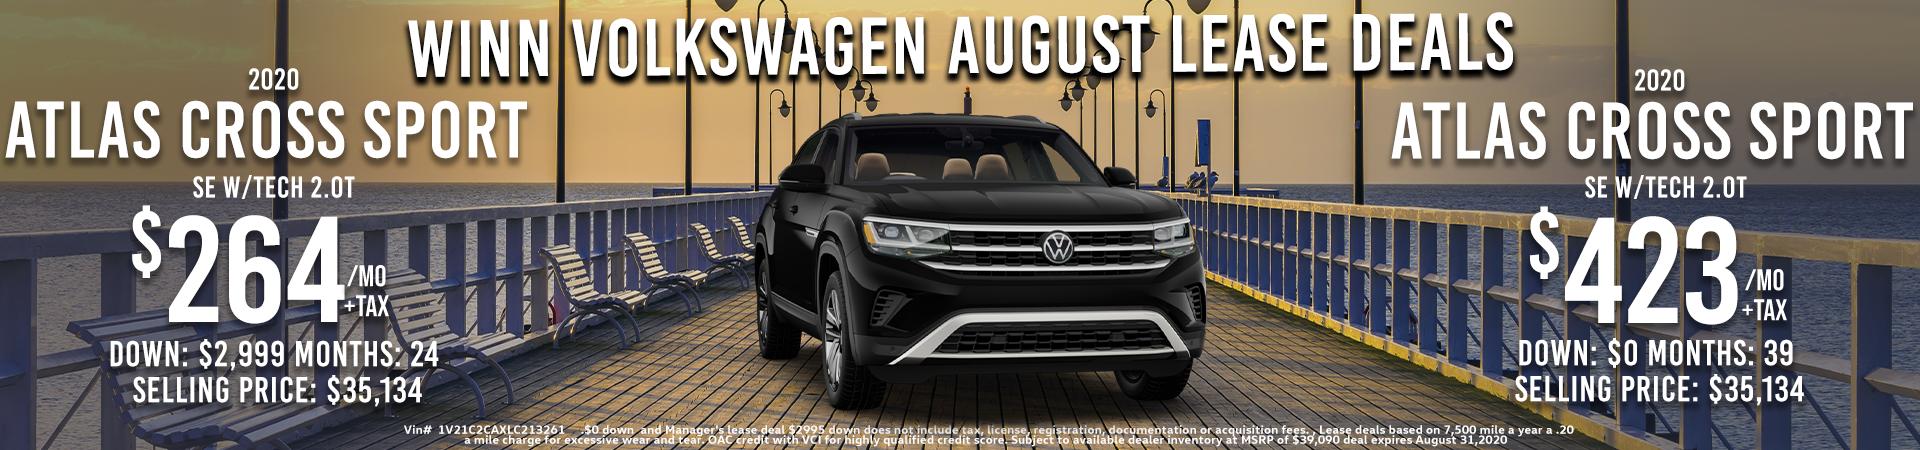 VW August Atlas Cross Sport Lease deals, Fremont, Milpitas, Union City, San Jose, Santa Clara, Stevens Creek, Sunnyvale, San Leandro , Hayward, Redwood City, Mountainview, , Bay area